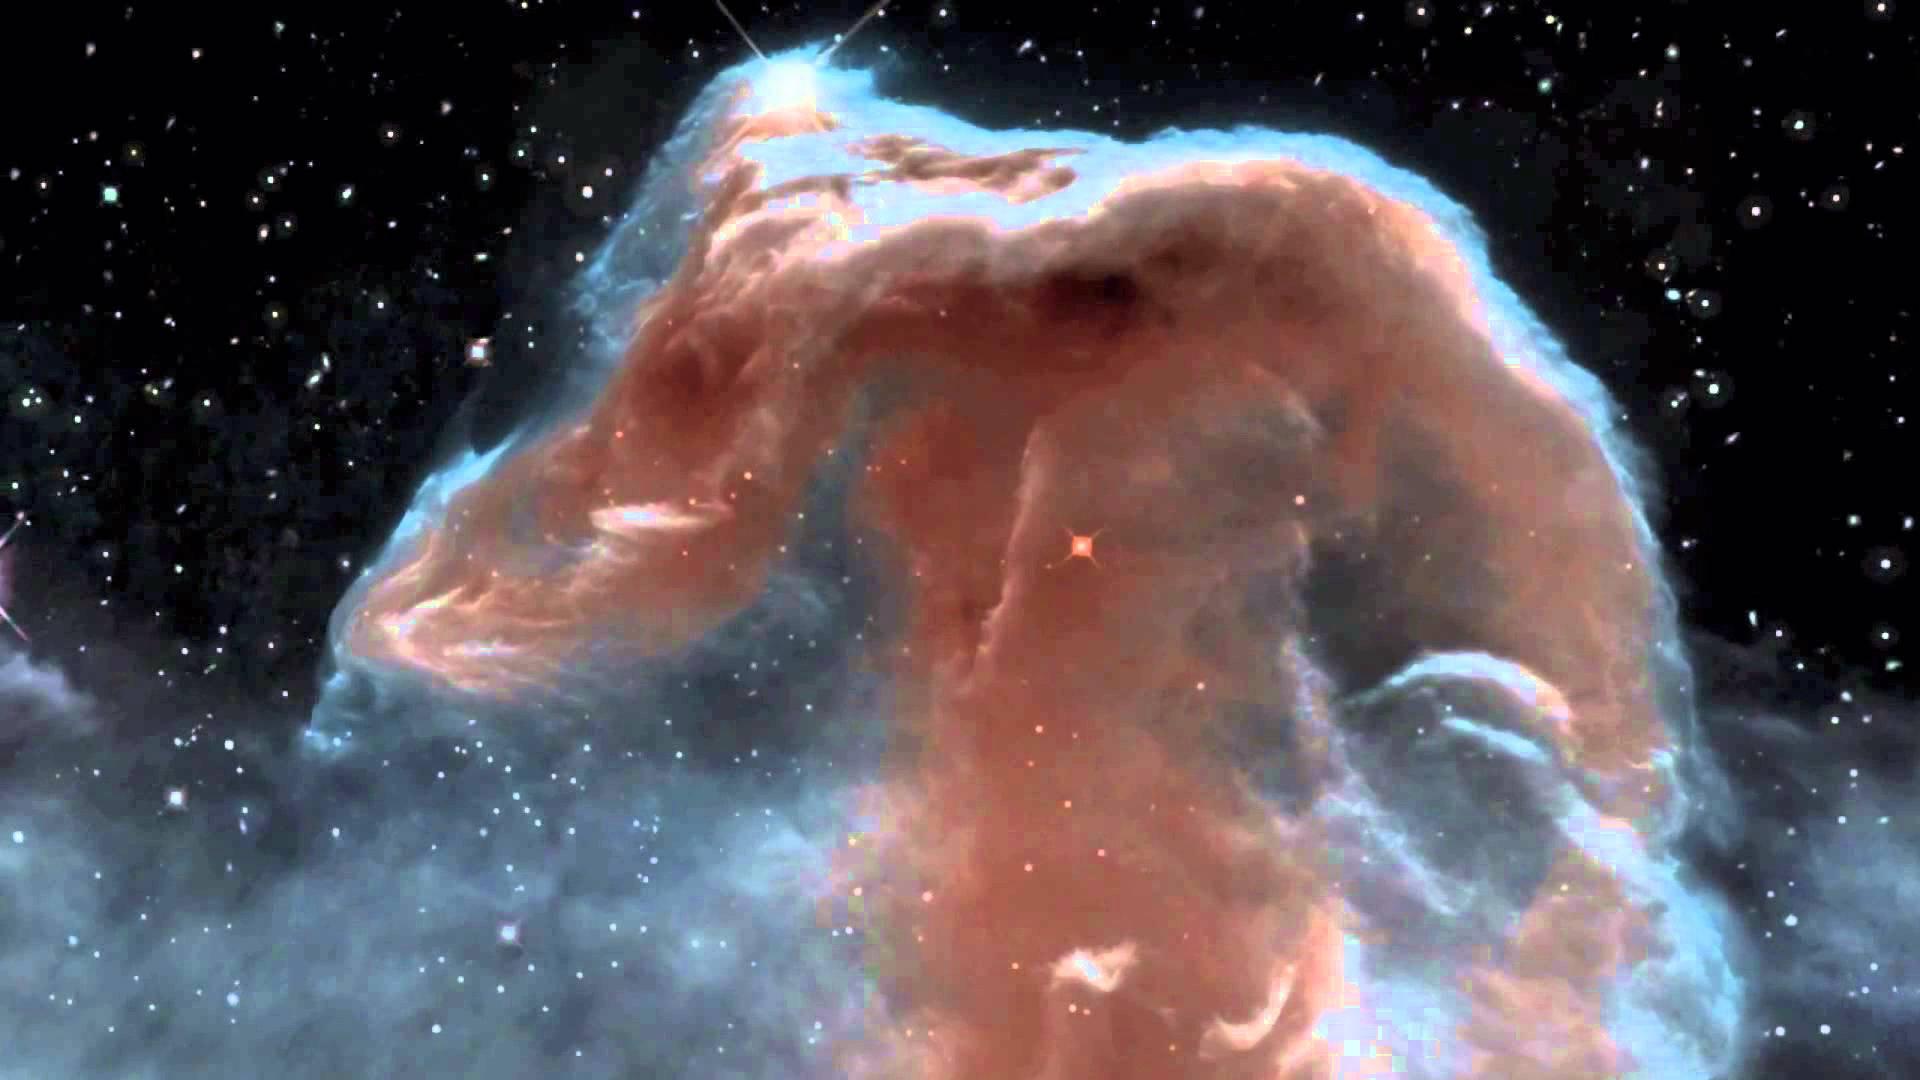 Hubble nebula wallpapers top free hubble nebula - Hubble space images wallpaper ...